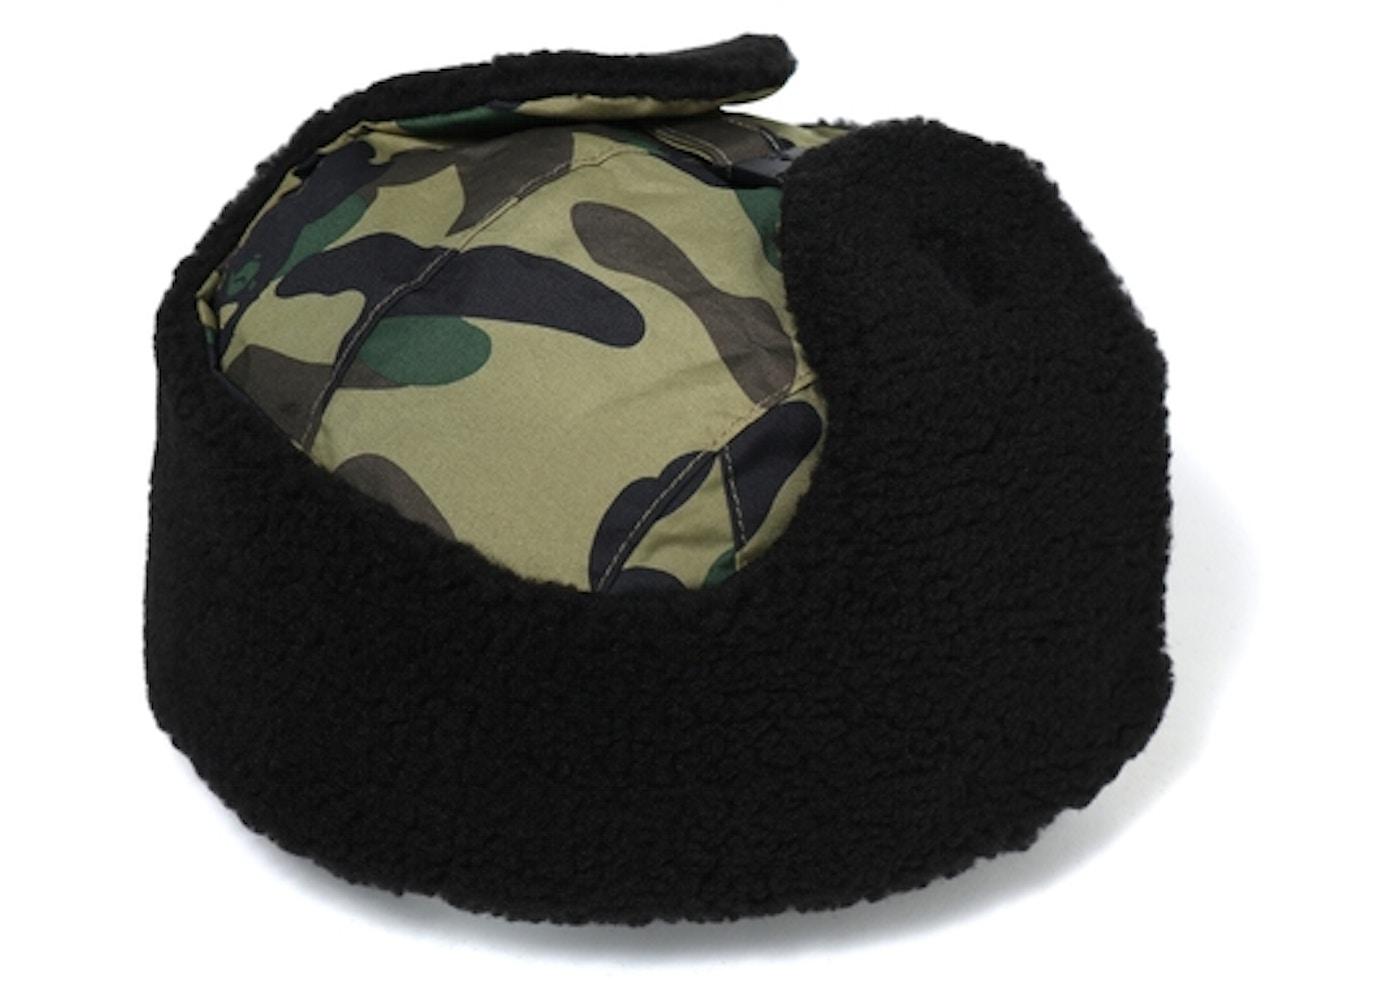 bc5b40744da47 Streetwear - Bape Headwear - Last Sale